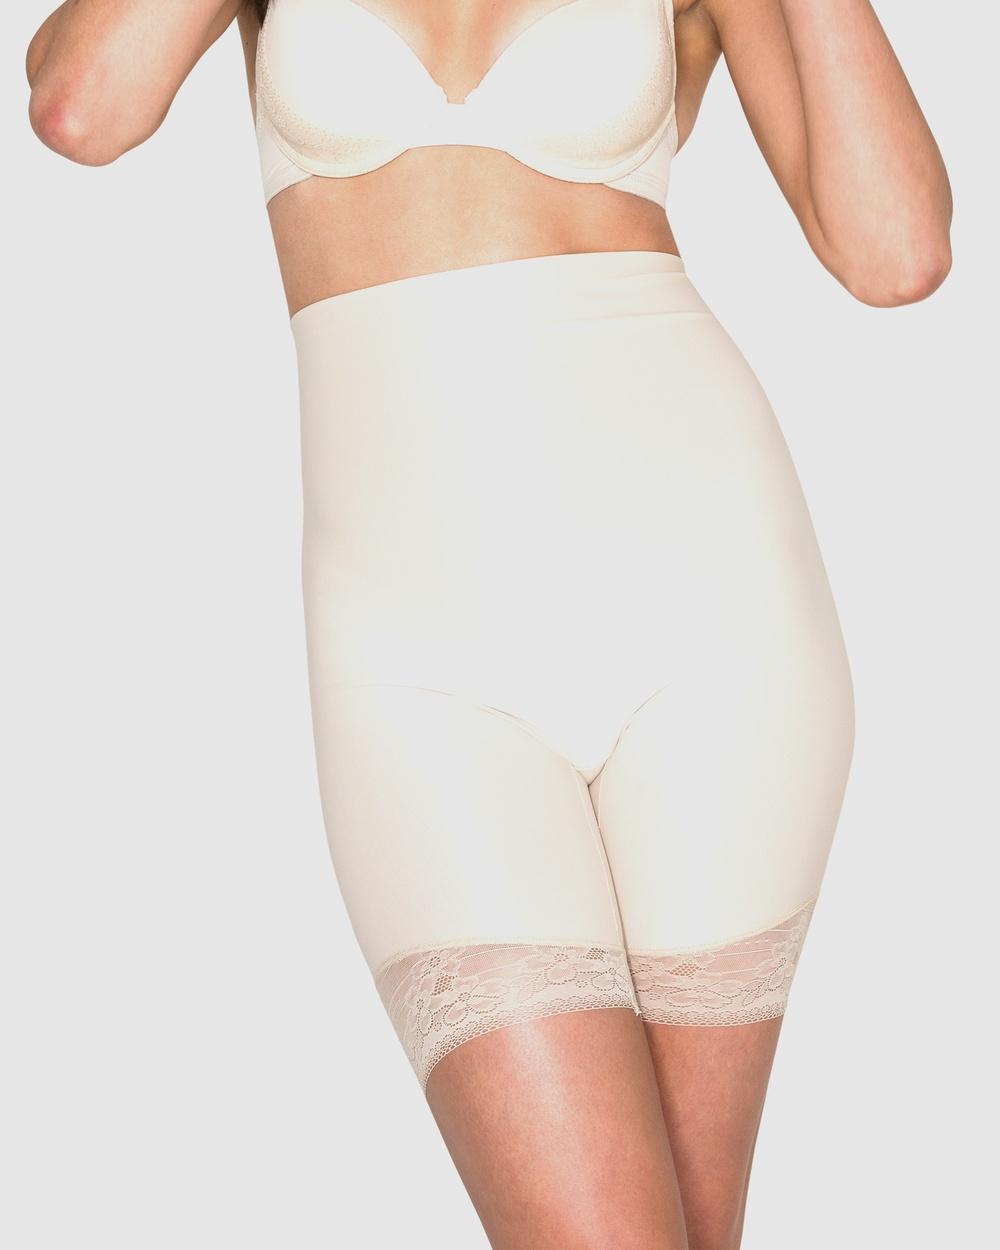 Hush Essensual Firm Control High Waist Thigh Shaper Lingerie Nude Australia